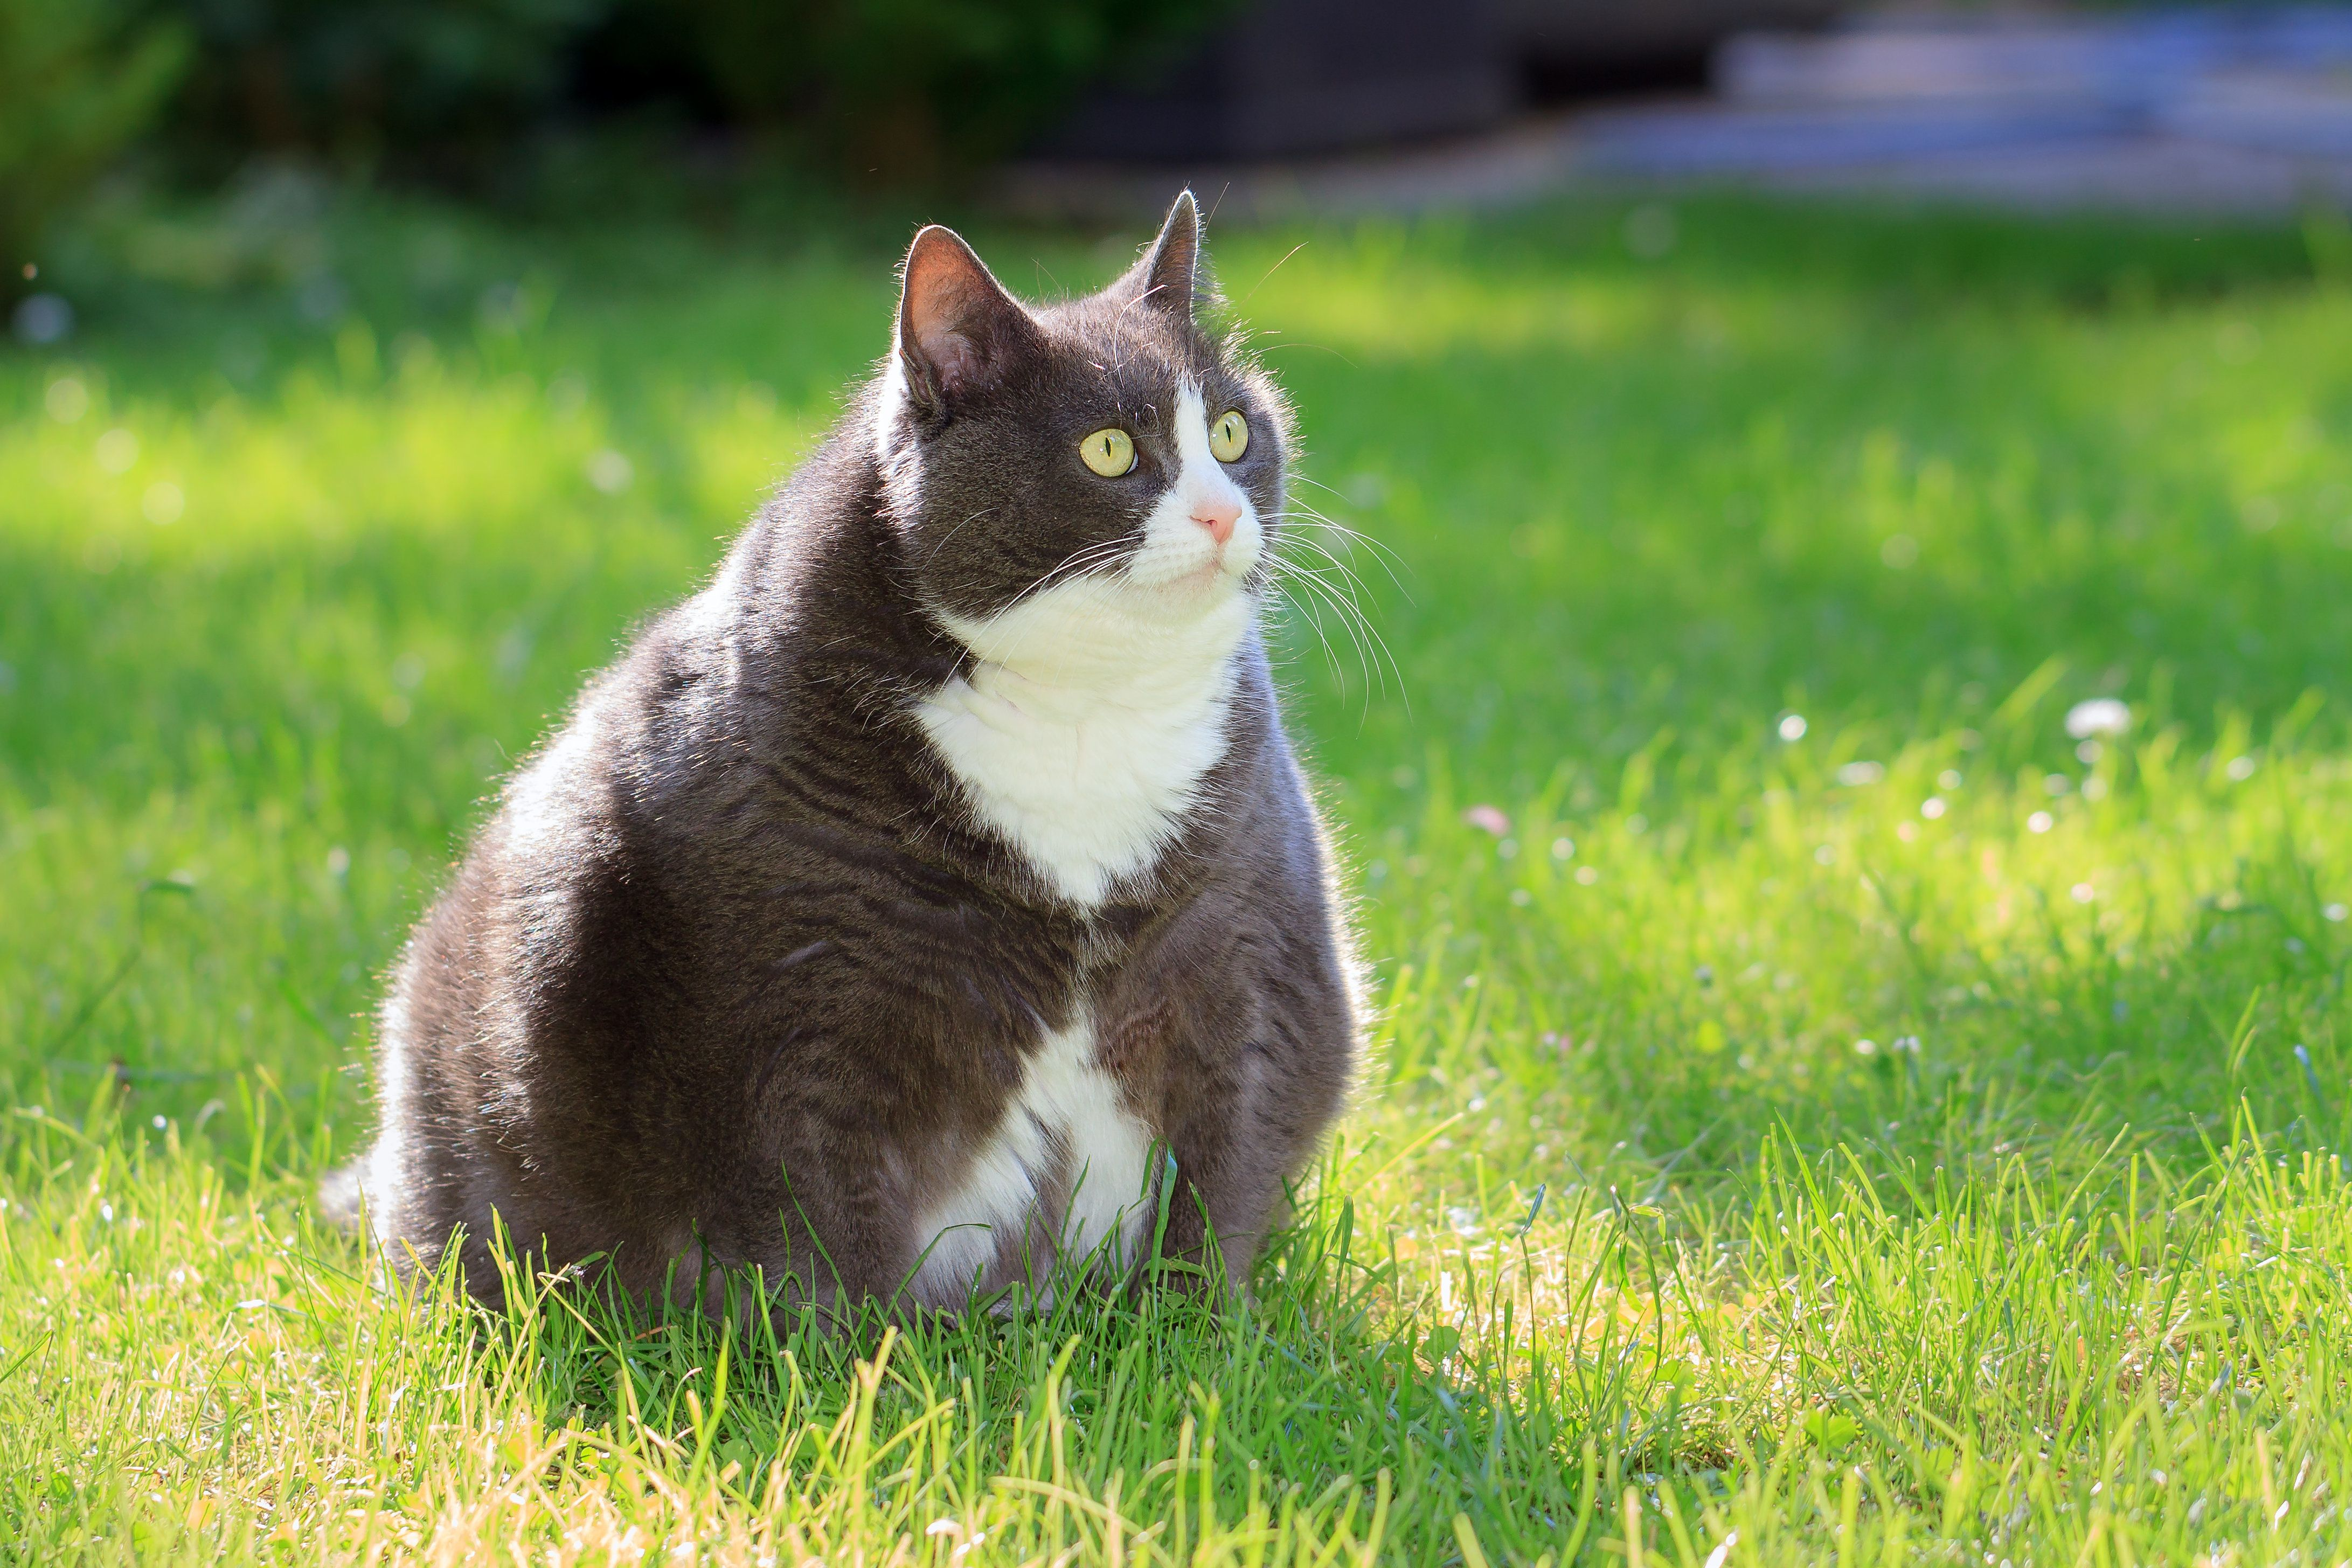 Fat pets are no joke.